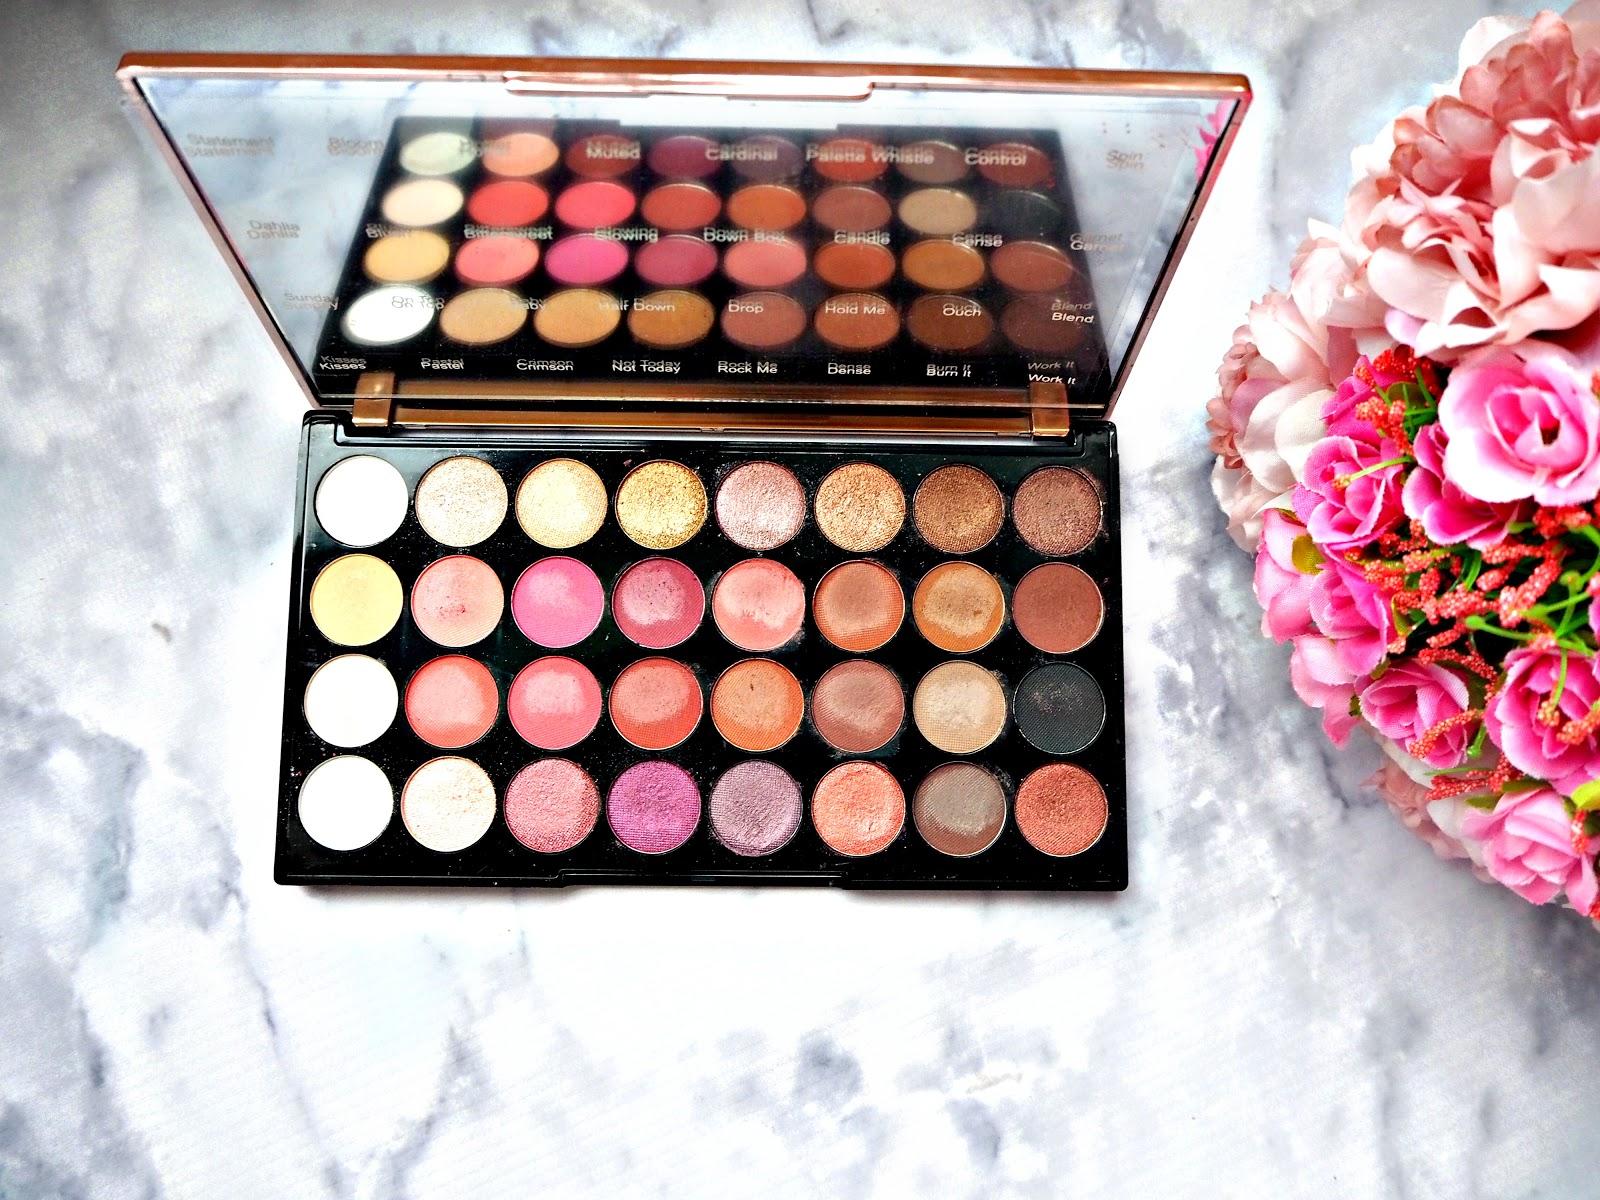 Makeup revolution flawless 3 vs 4